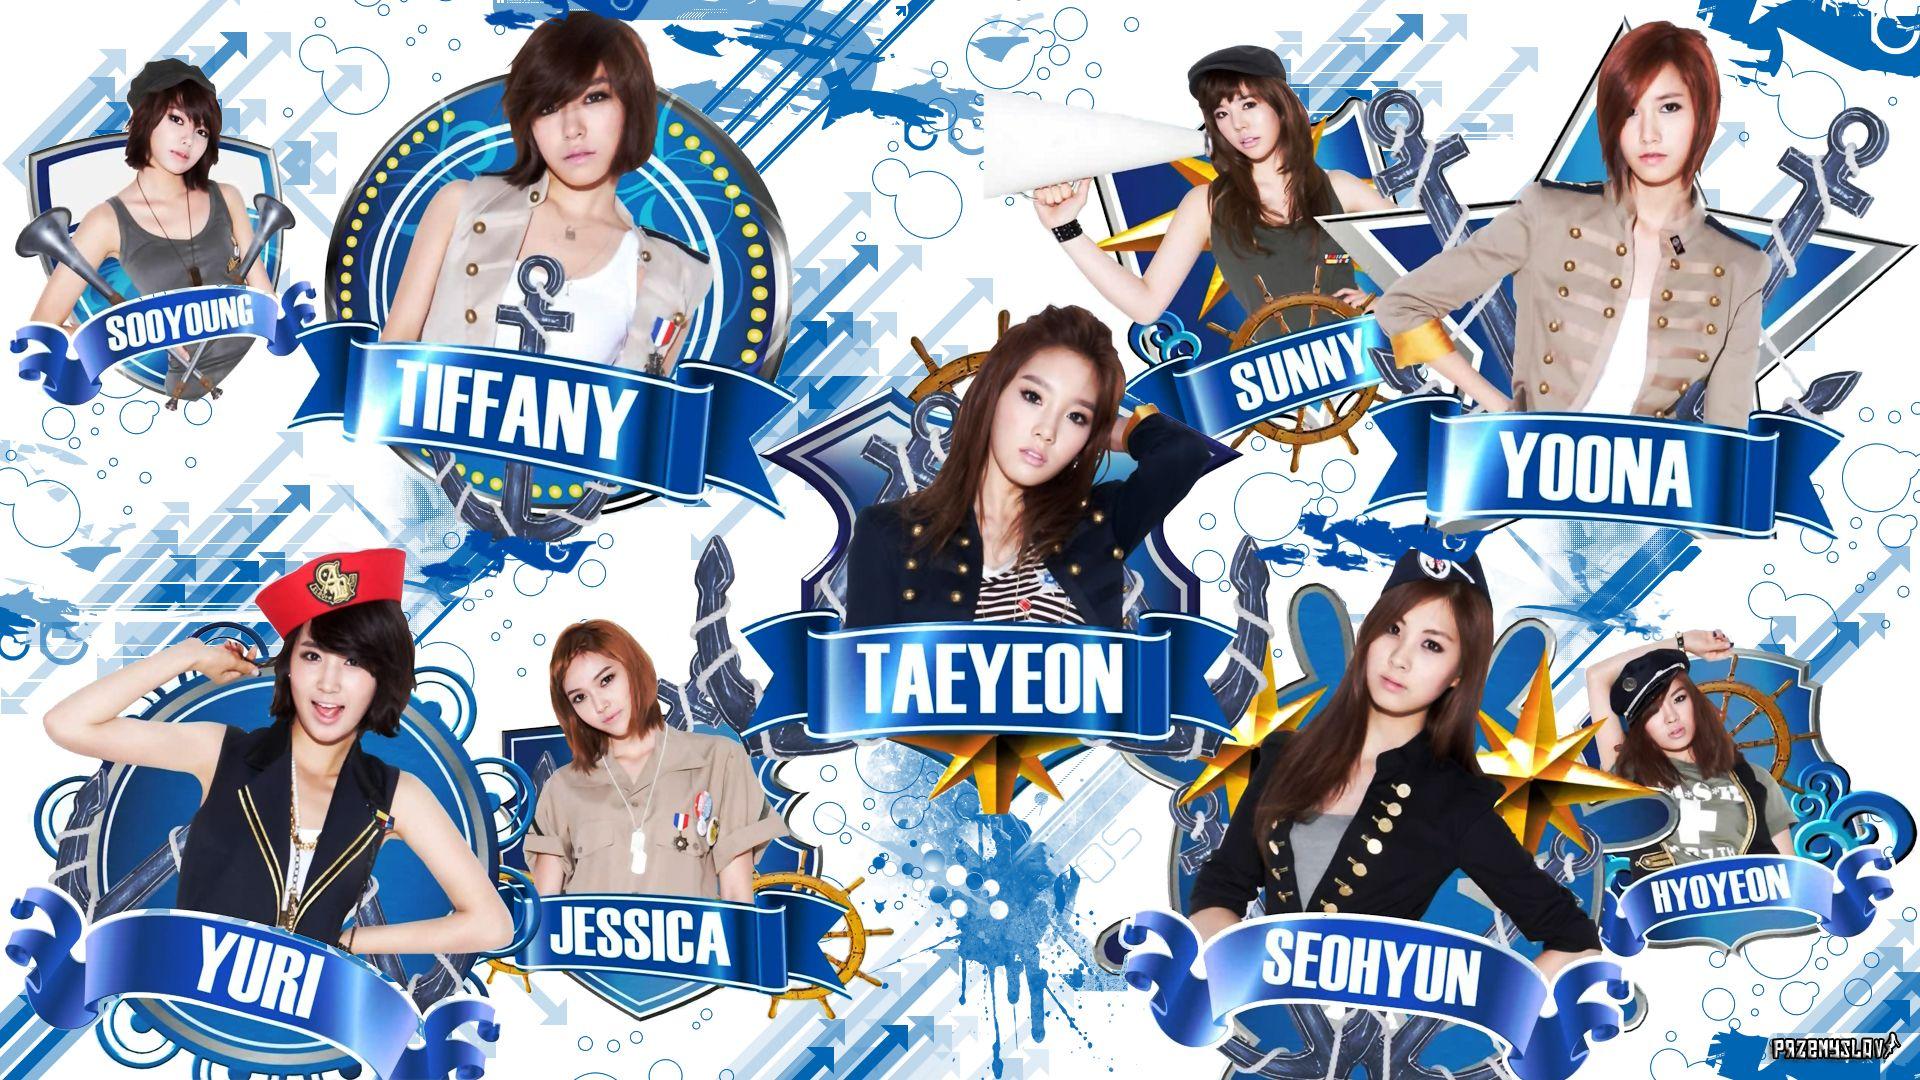 Girls Generation Names Wallpaper Backgrounds 1920x1080 Px Hd Desktop Wallpapers Girls Generation Snsd Seohyun